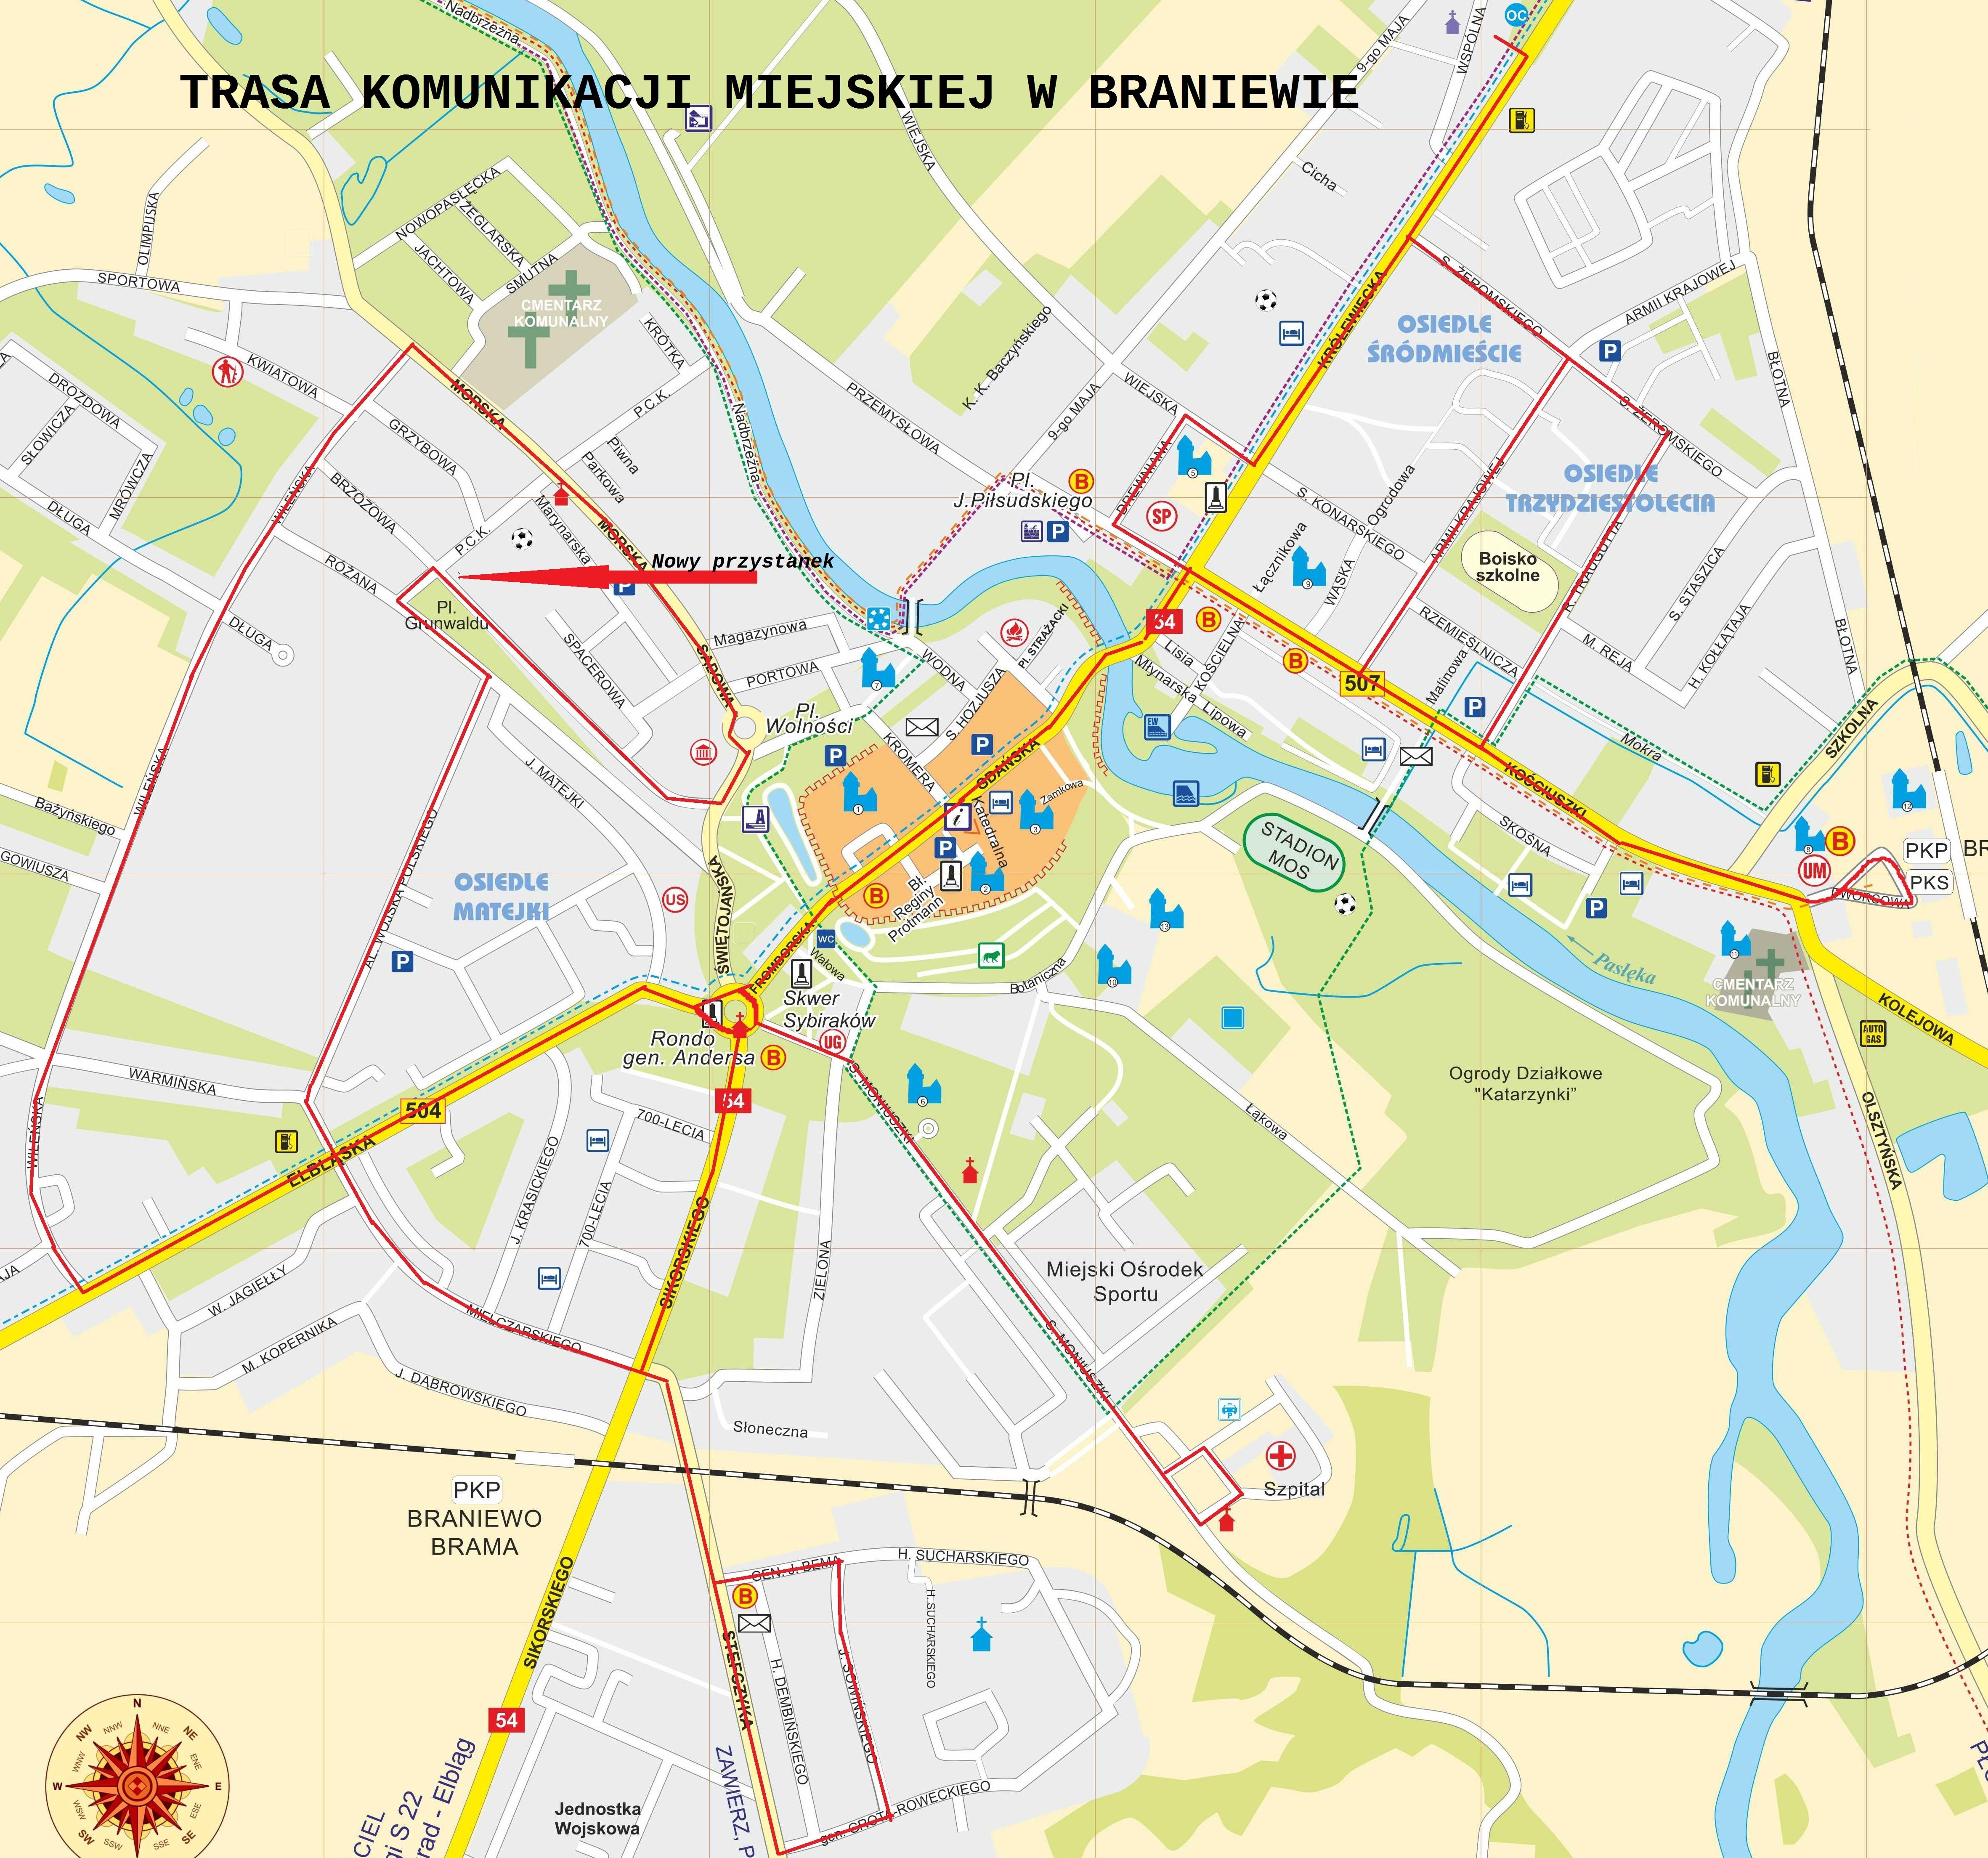 http://m.wm.pl/2018/01/orig/0000097987-trasa-komunikacji-miejskiej-439008.jpg